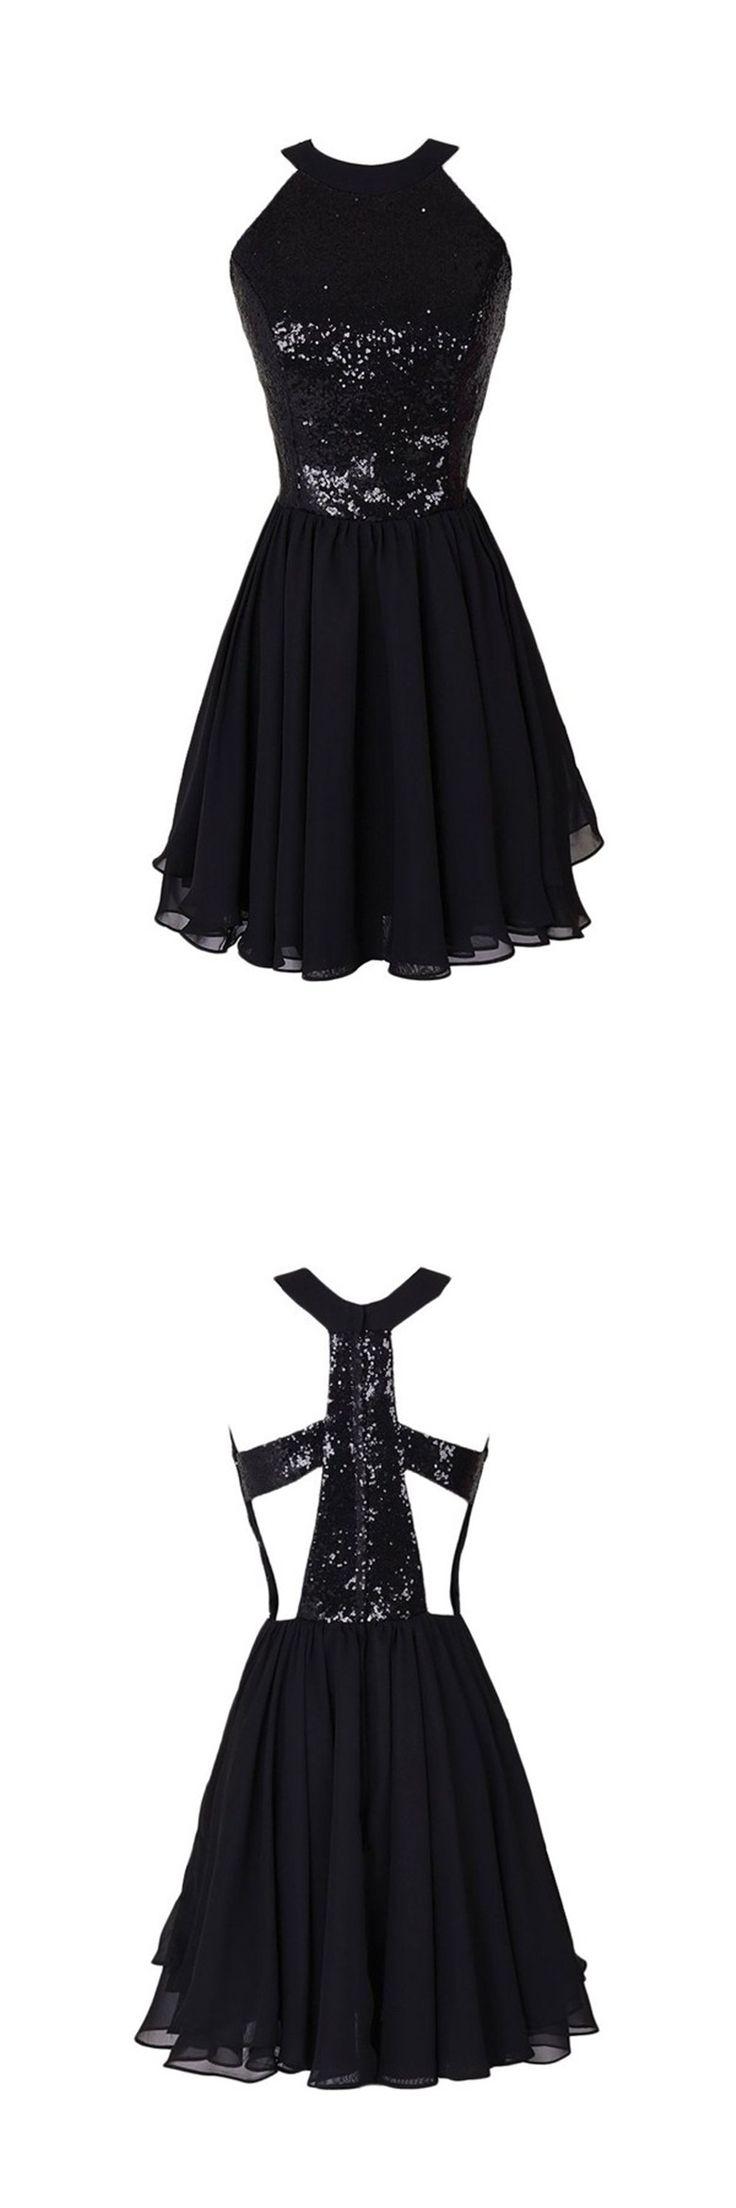 2016 homecoming dress,short homecoming dress,black homecoming dress,mini homeoming dress,unique homecoming dress,a-line homecoming dress